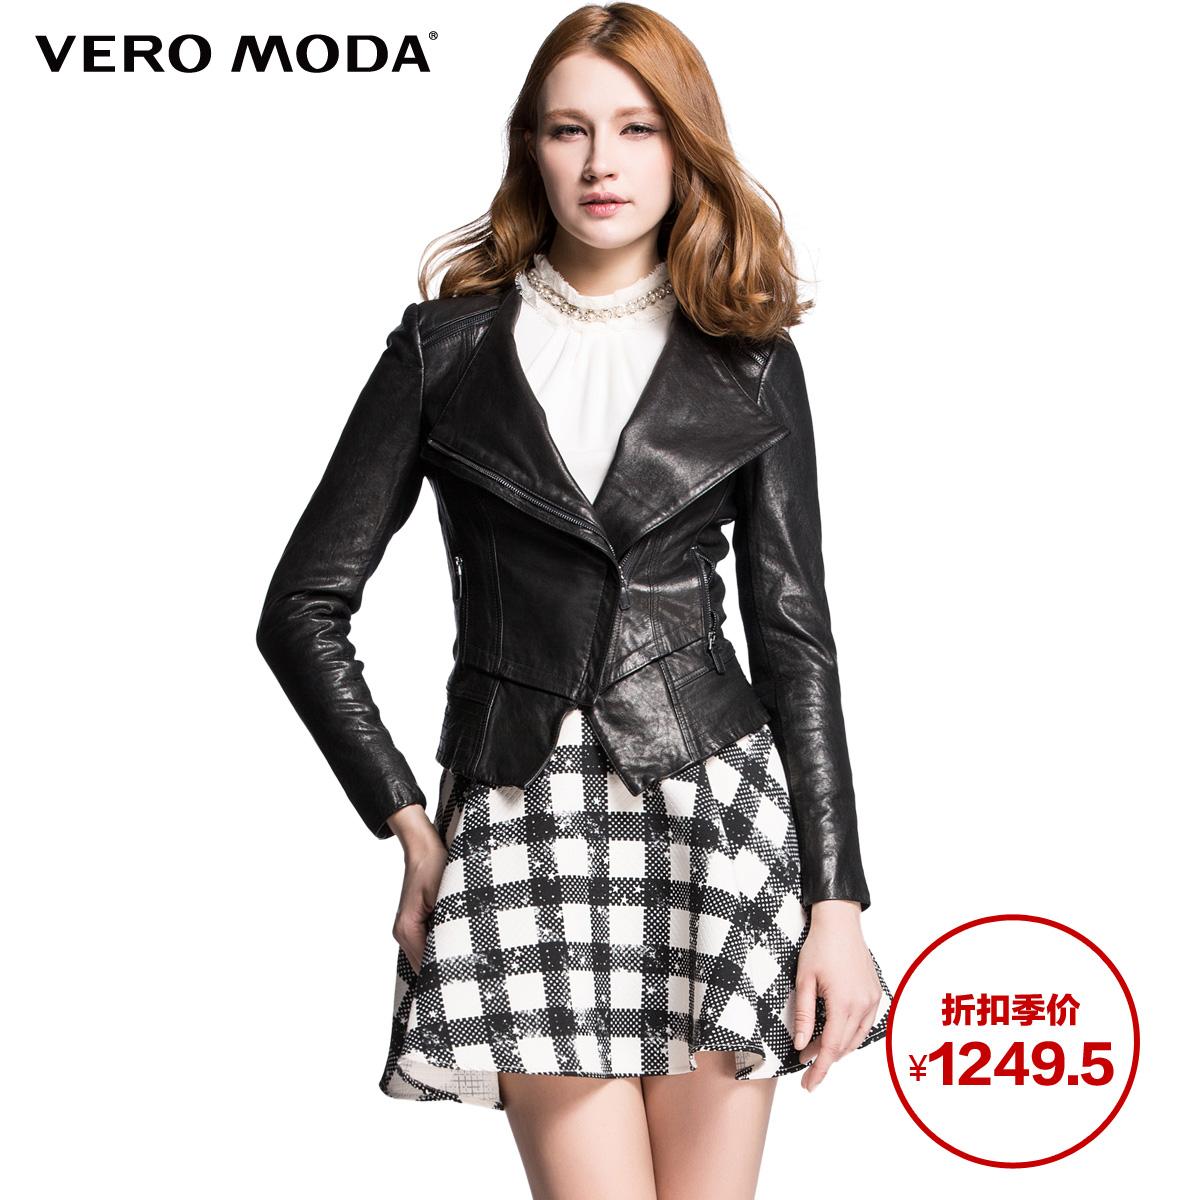 Кожаная куртка VERO MODA 315110015 1249.5 daybreak hardlex uhren 2015 damske hodinky orologi di moda relojes relogios db2161